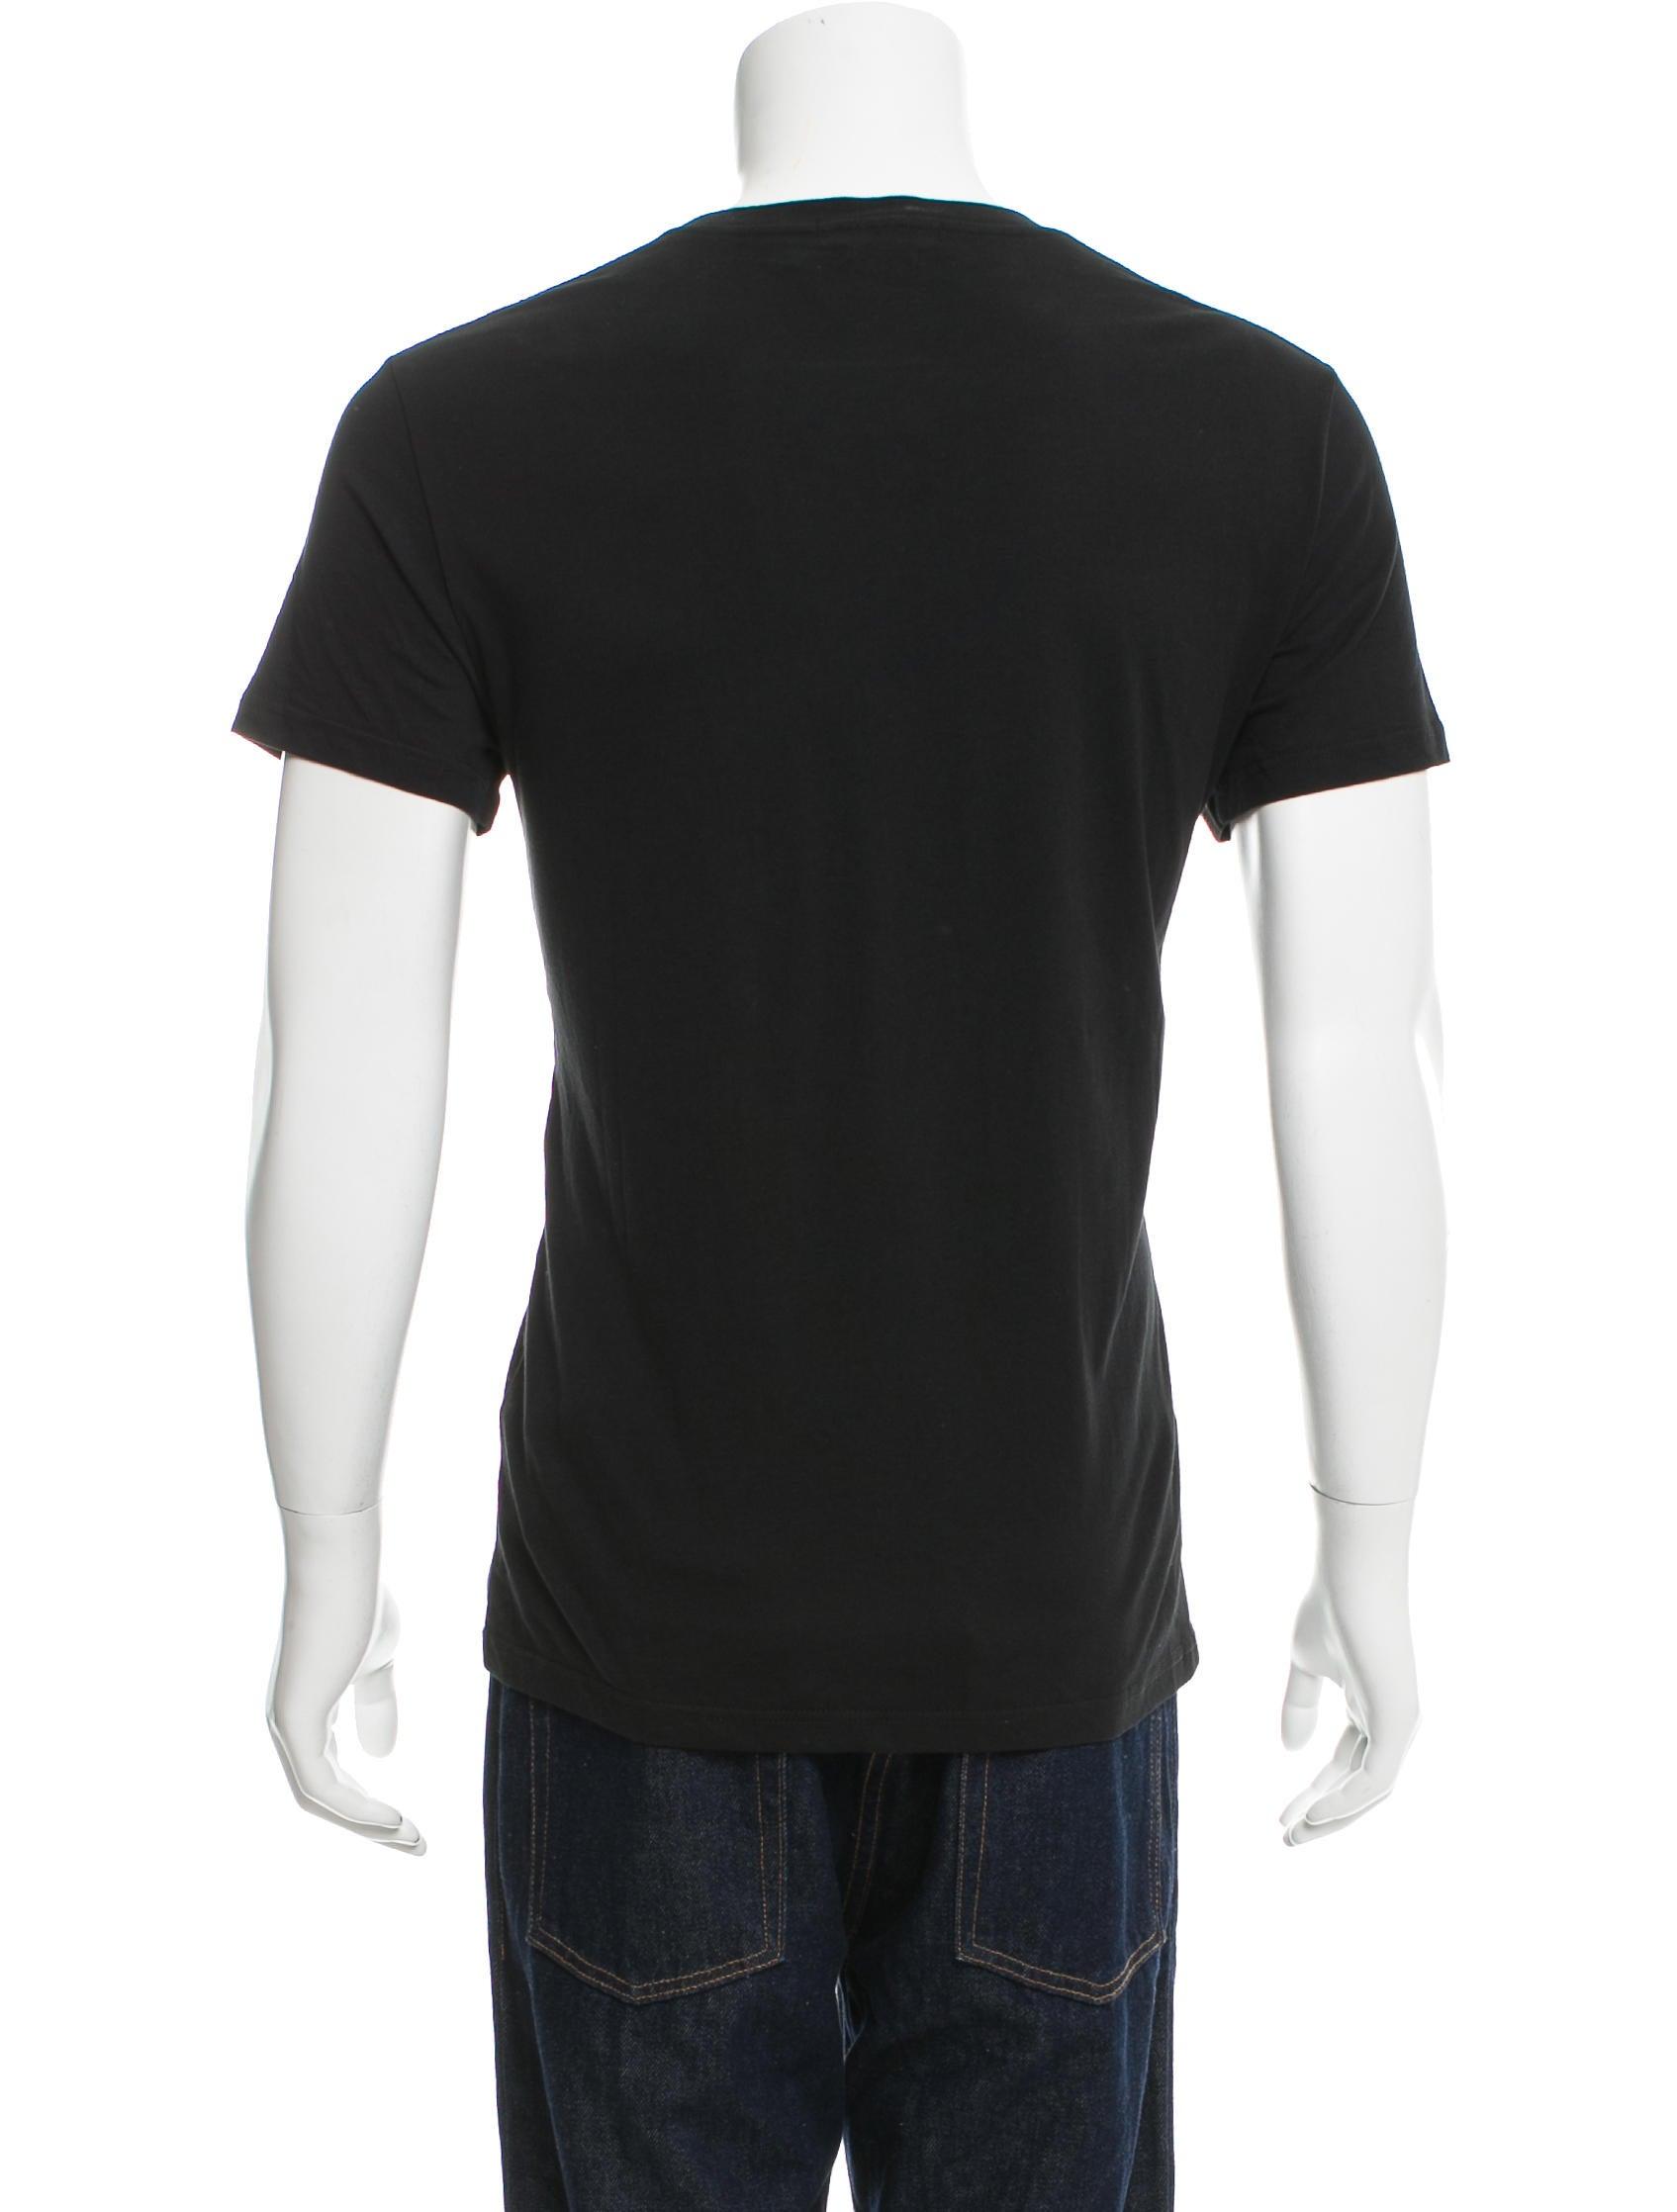 Alexander mcqueen graphic skull t shirt w tags clothing for Alexander mcqueen shirt men